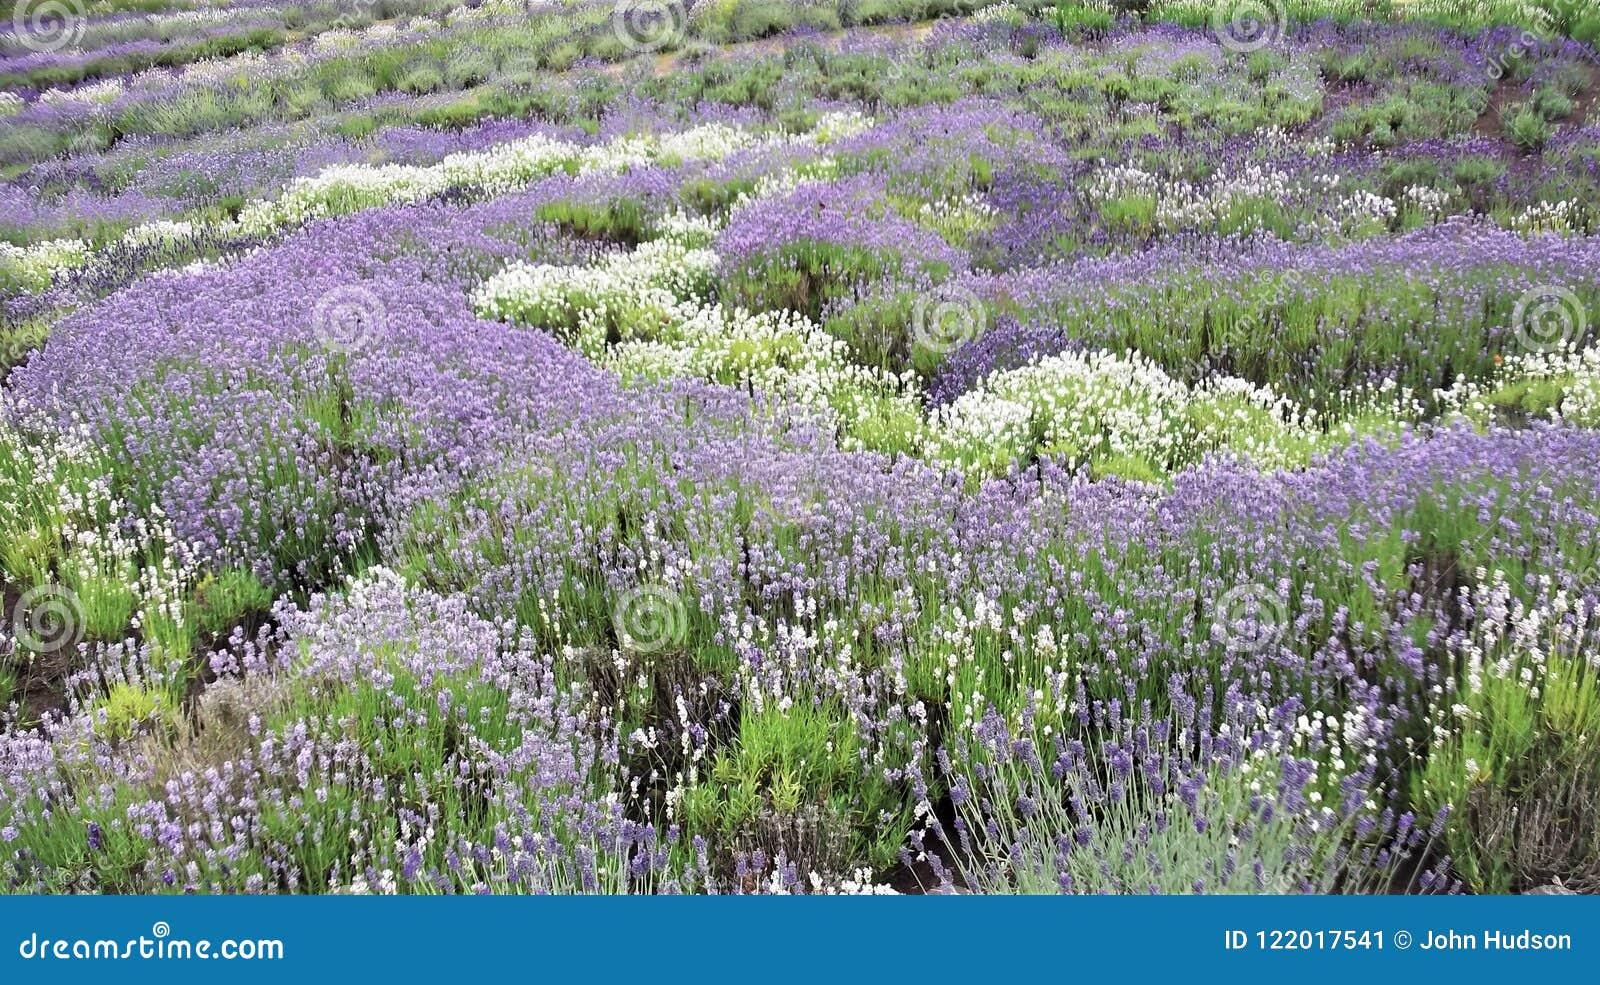 Lavender θάμνοι στην αφθονία το μέσο καλοκαίρι